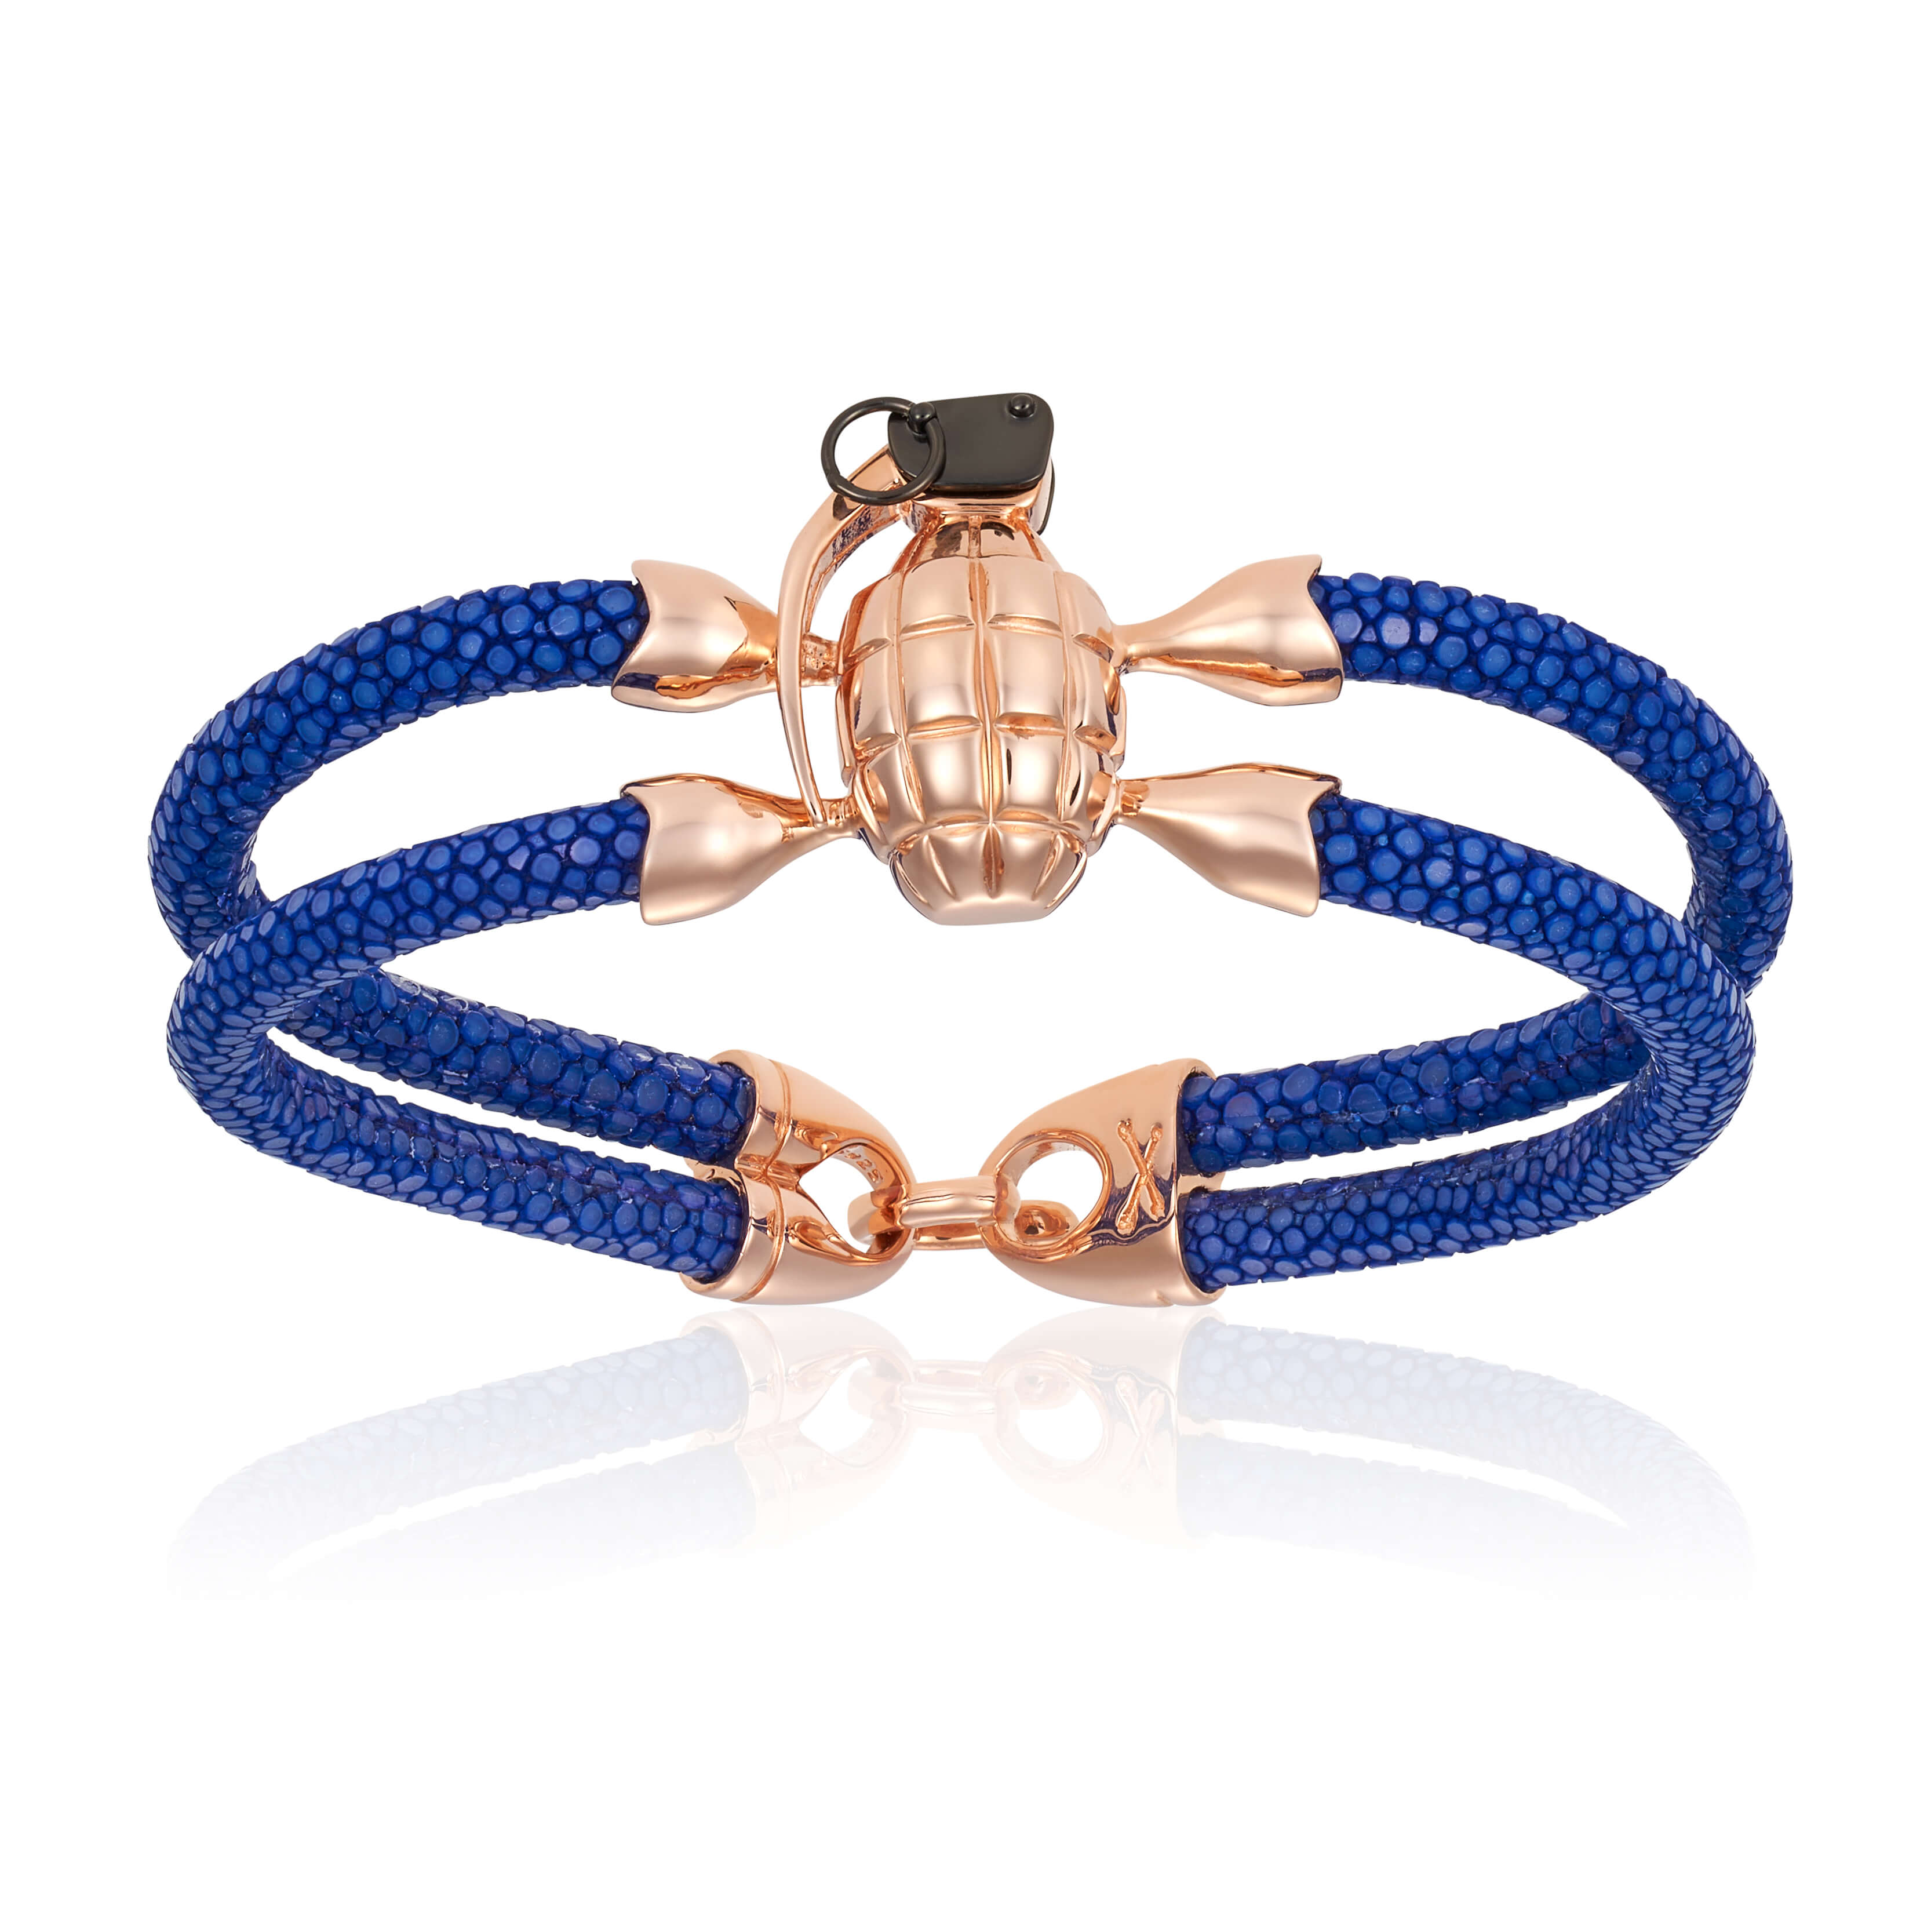 Blue stingray bracelet with rose gold grenade for man